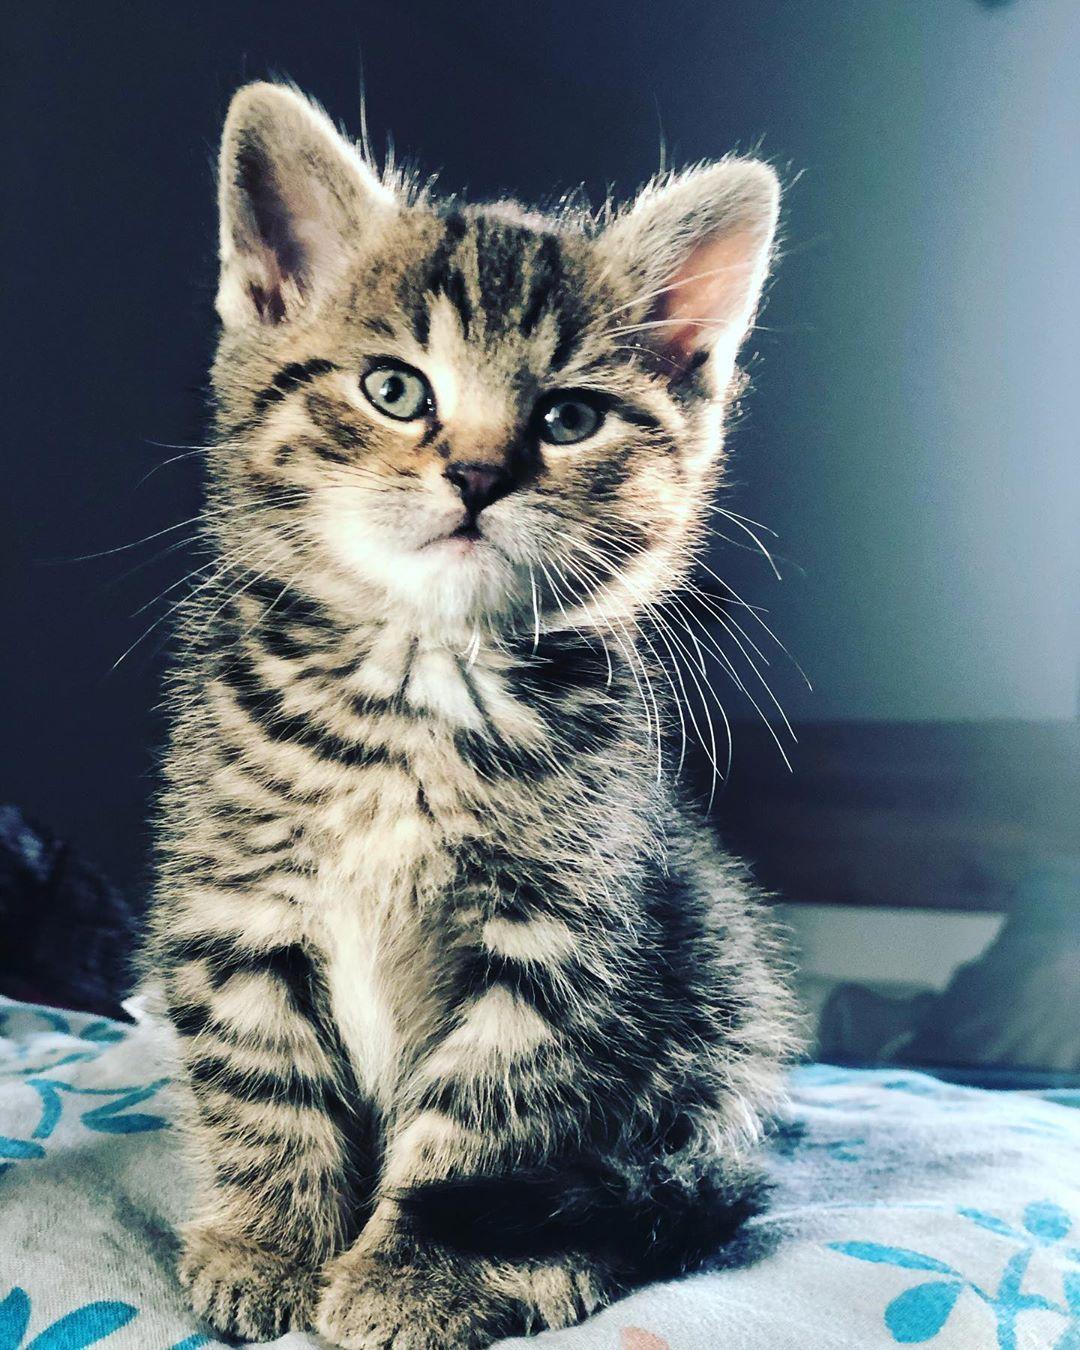 Ms Daisy Cats Catsofinstagram Catstagram Kitten Kittens Daisycat Mourek Czechcat Roztomilostsama Cats Of Instagram Cat Day Cats